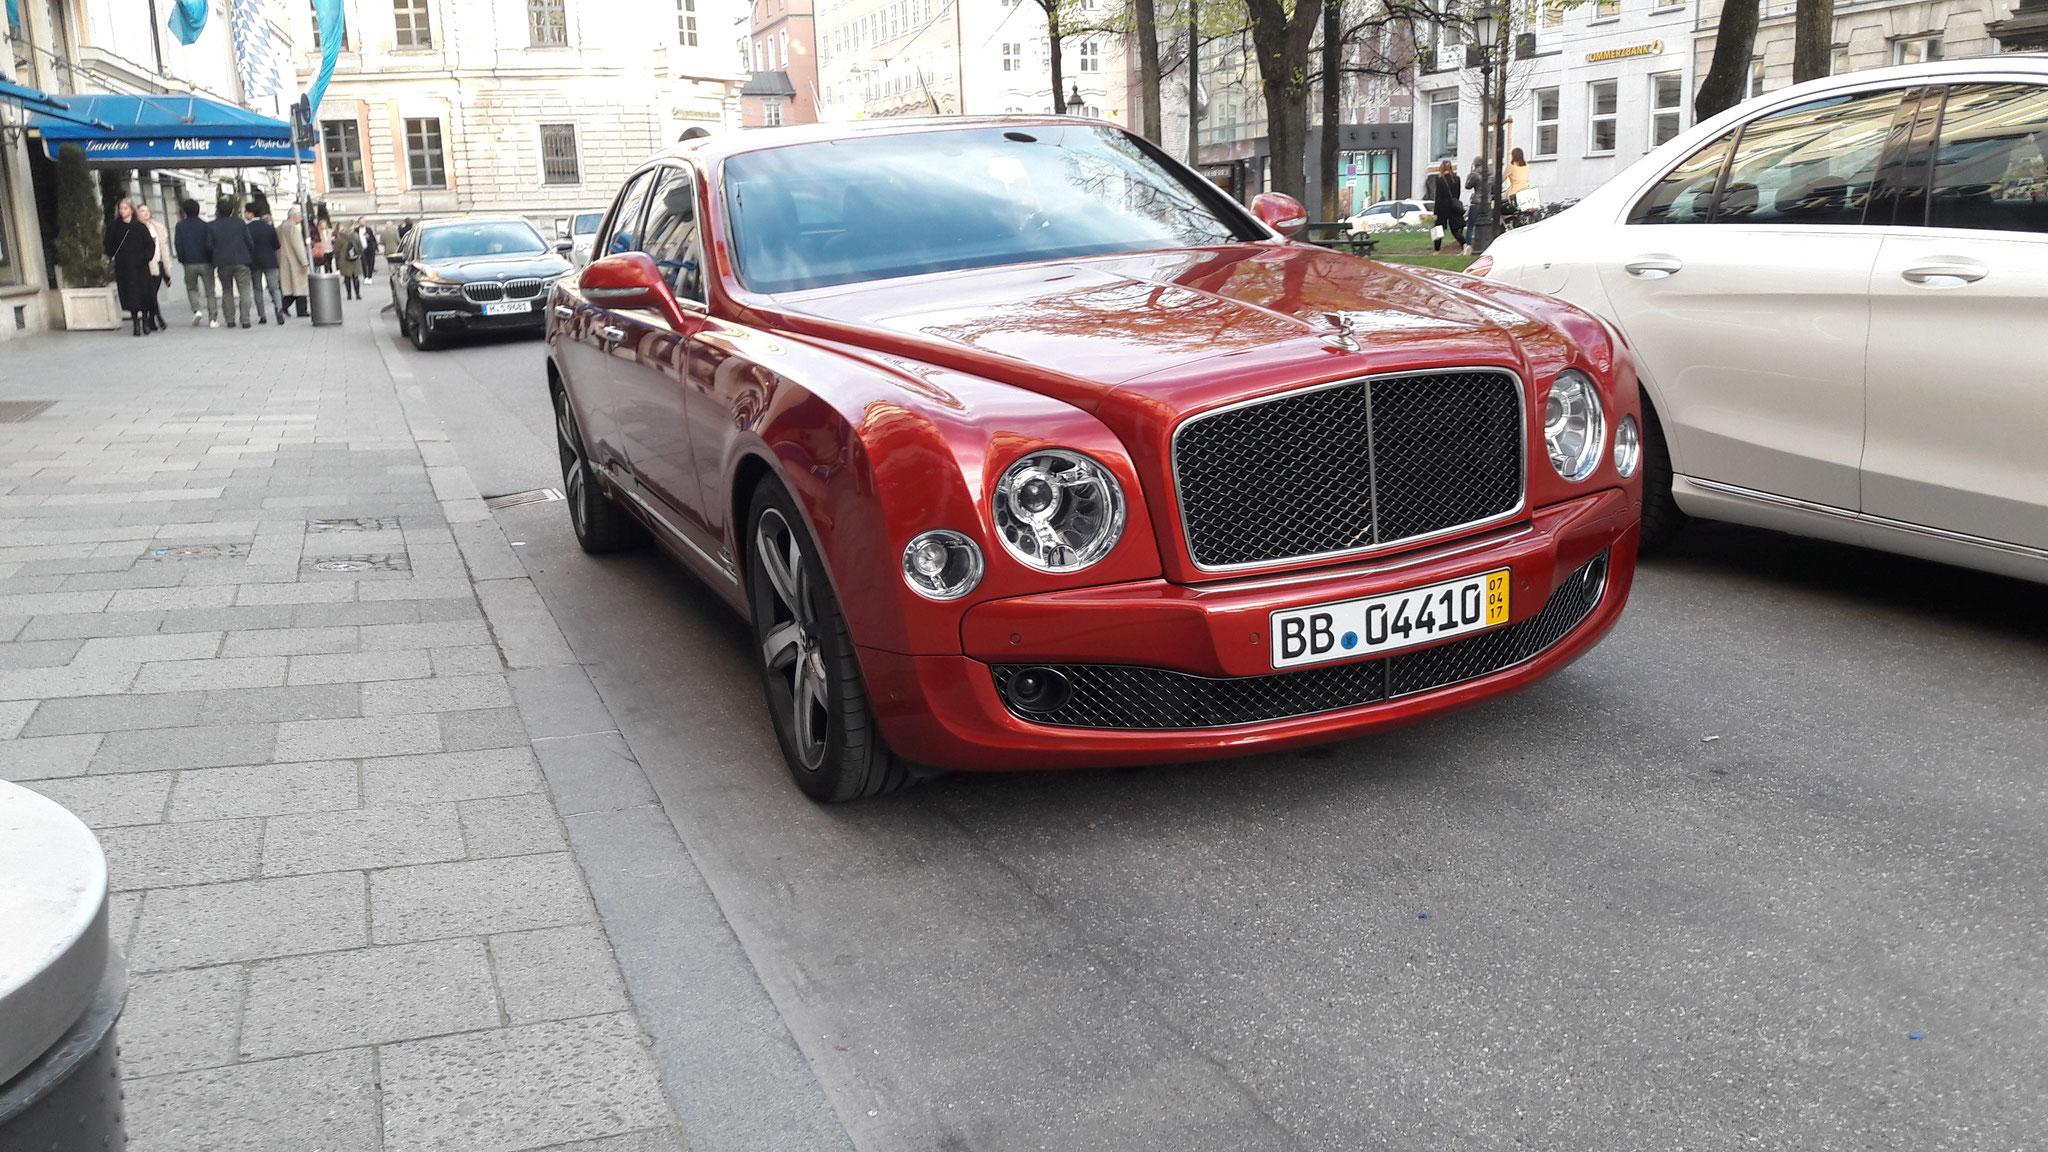 Bentley Mulsanne - BB-04410